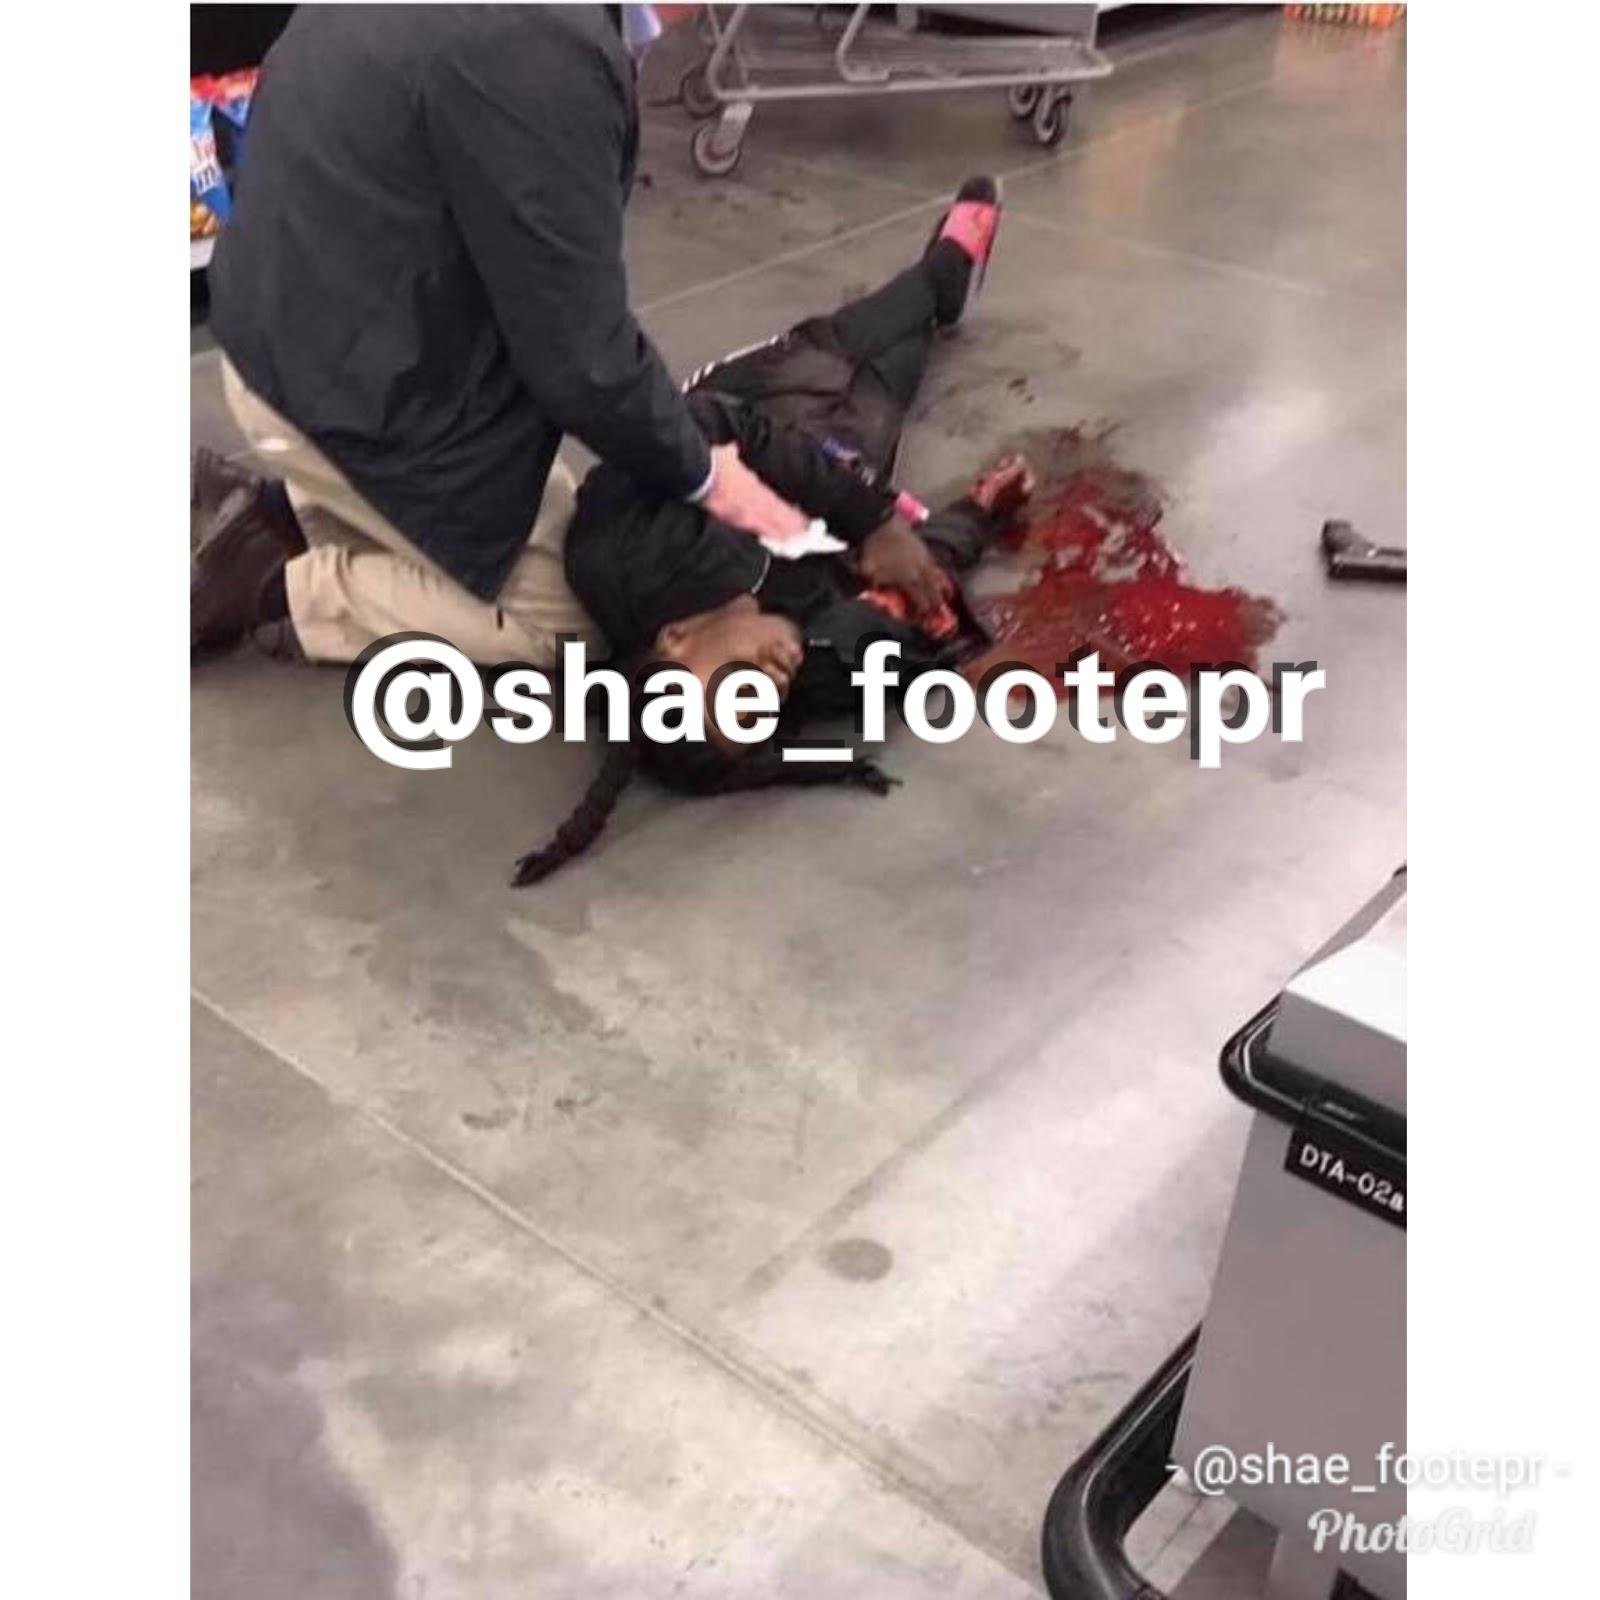 Man Shoots Walmart Employee Then Turns The Gun On Himself